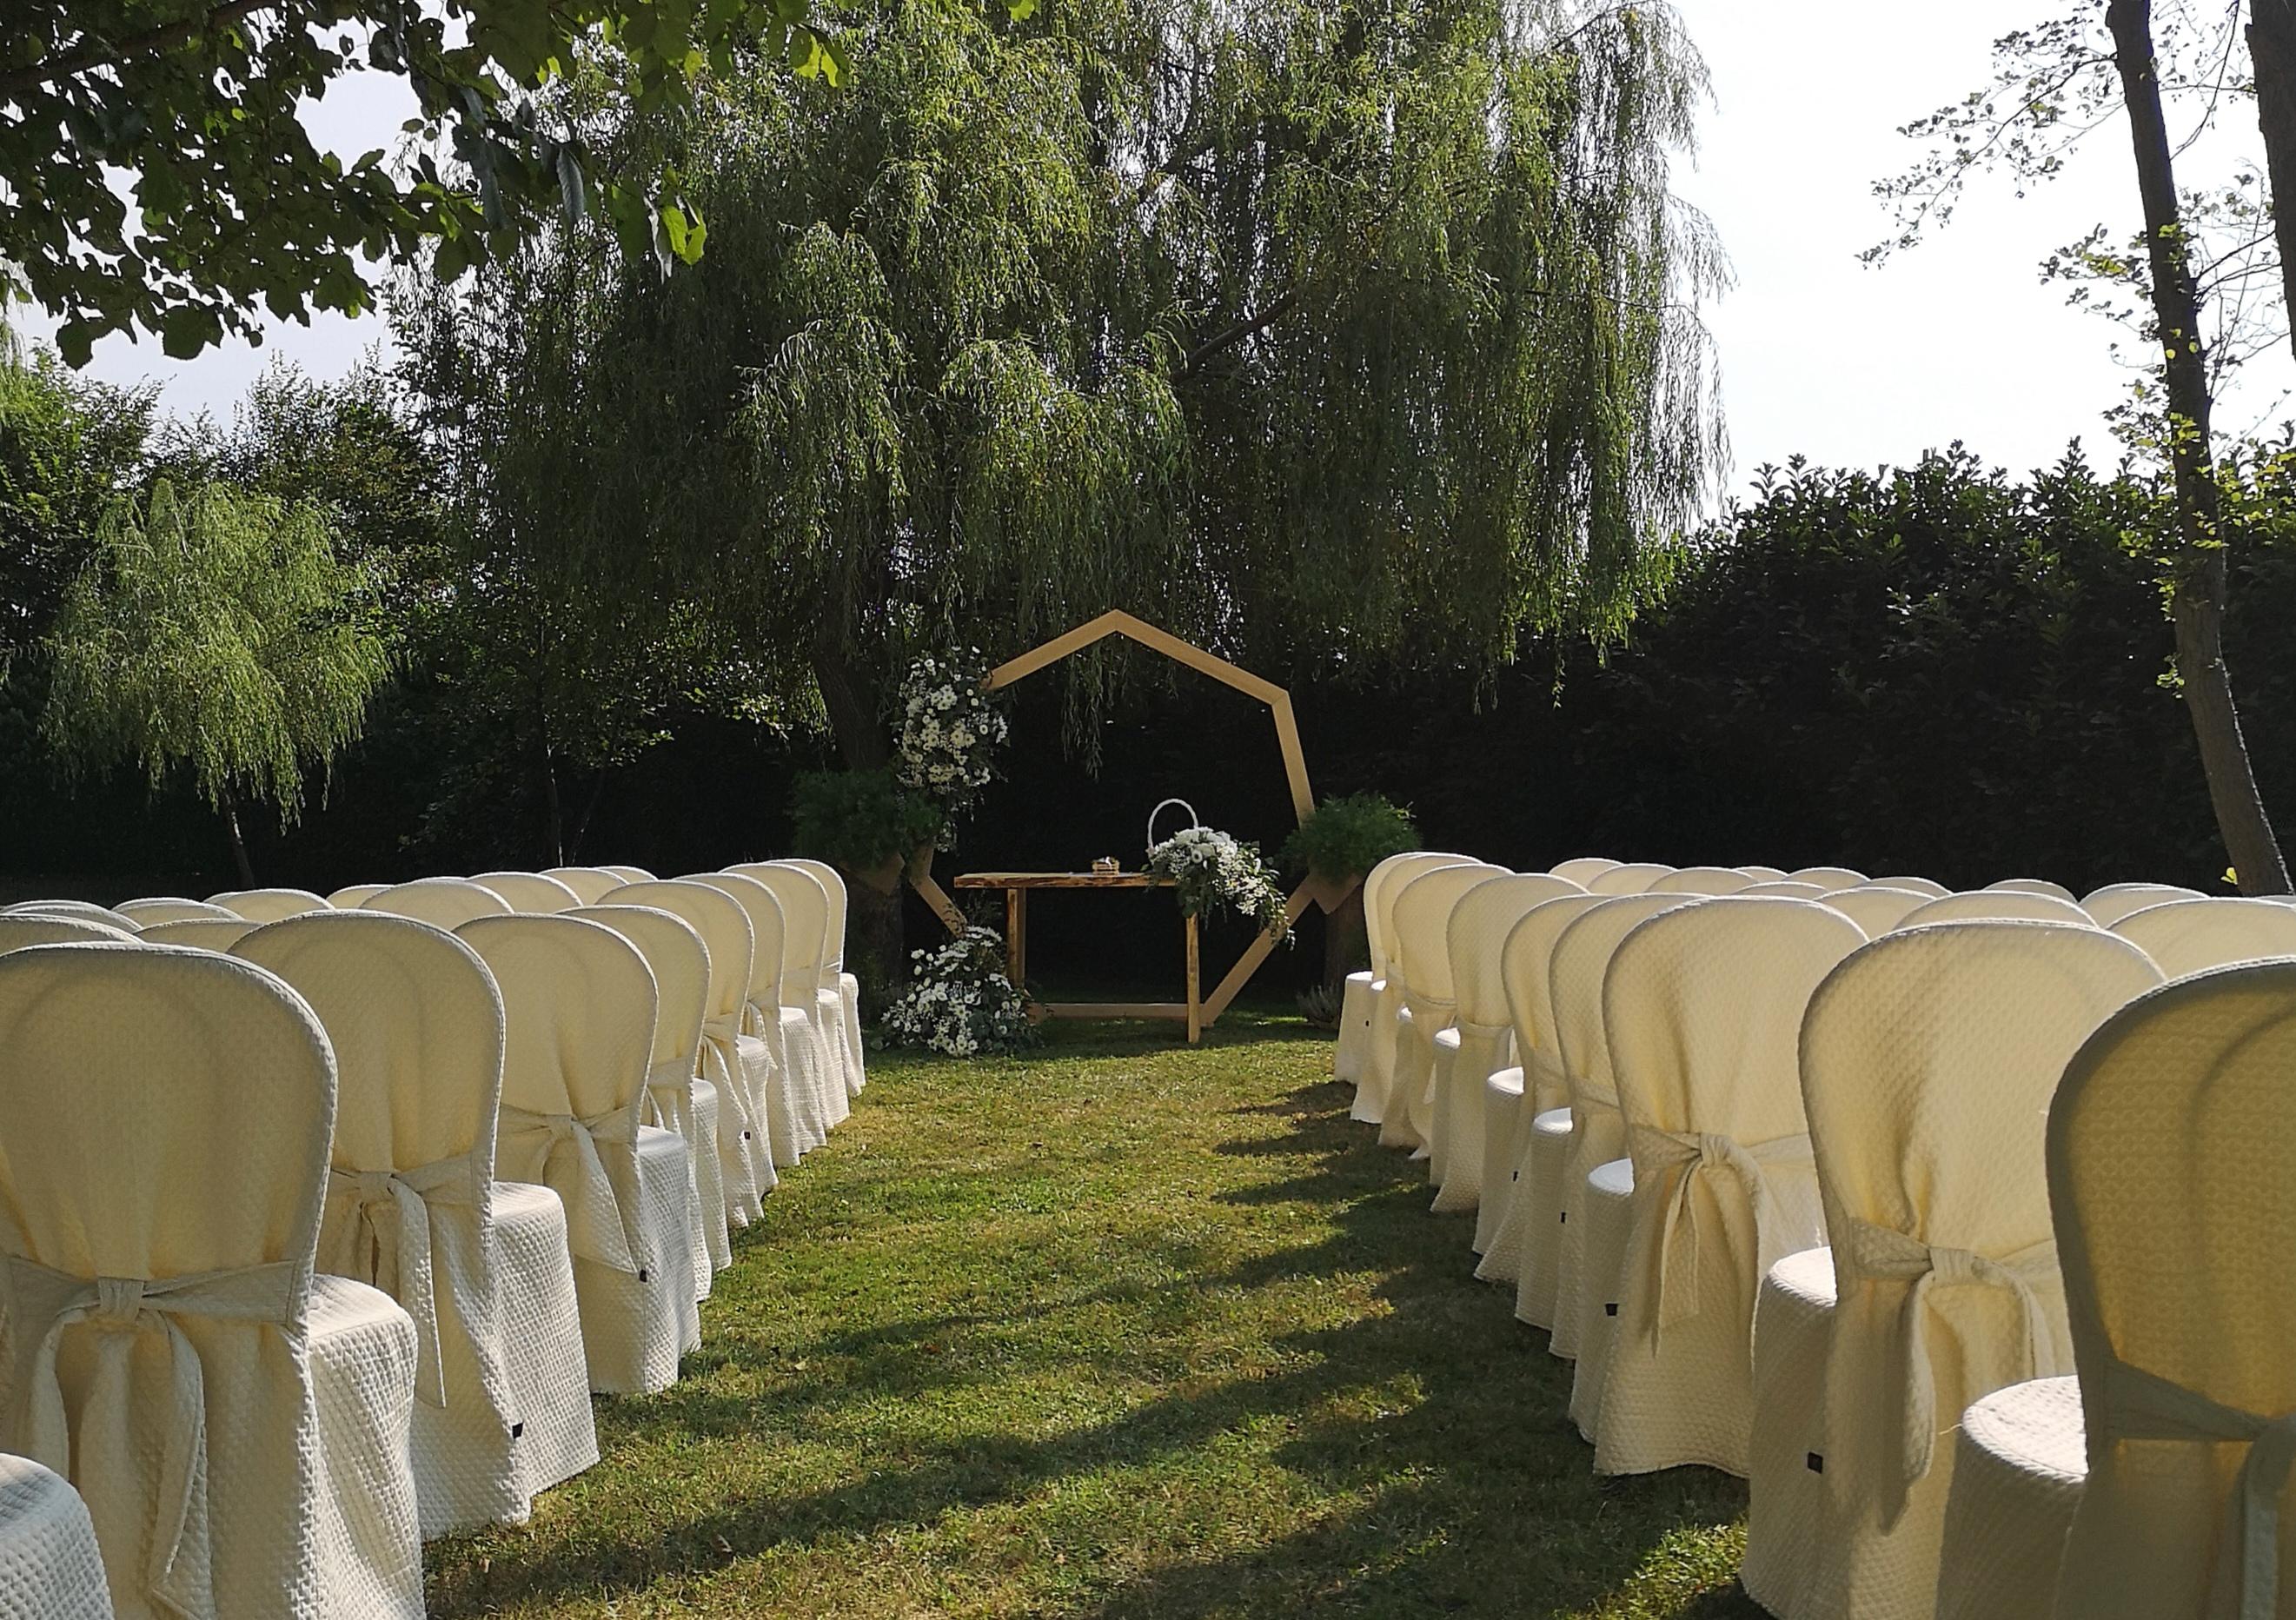 Cerimonia nel parco.jpg